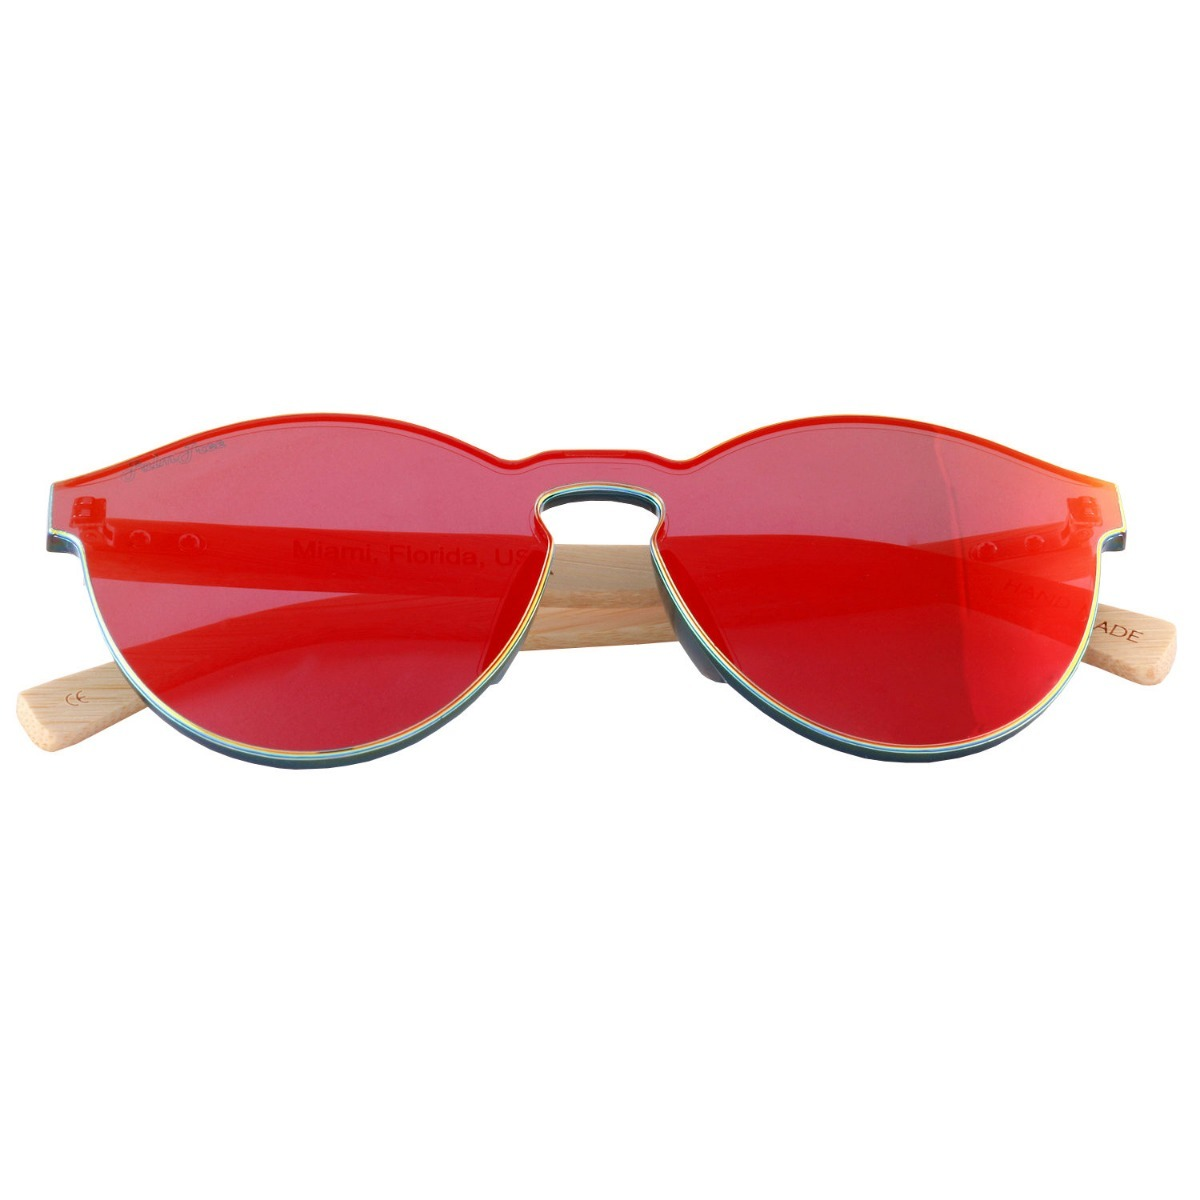 b253dd975a lentes de sol bambu madera rojos palmtree uv400 ecologicos. Cargando zoom.